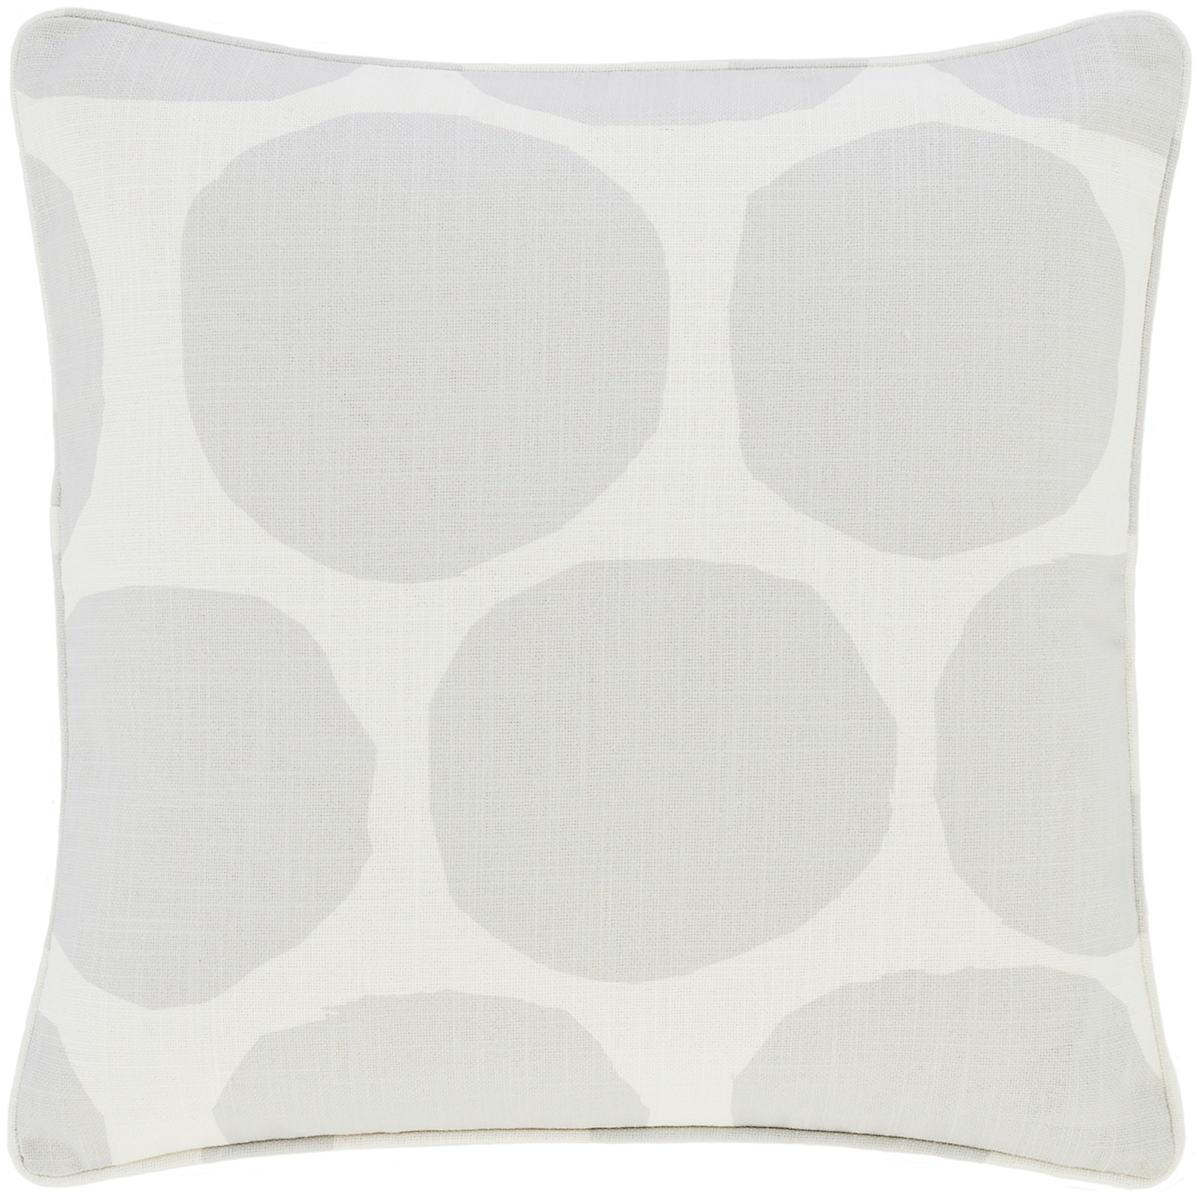 On The Spot Grey Indoor/Outdoor Decorative Pillow